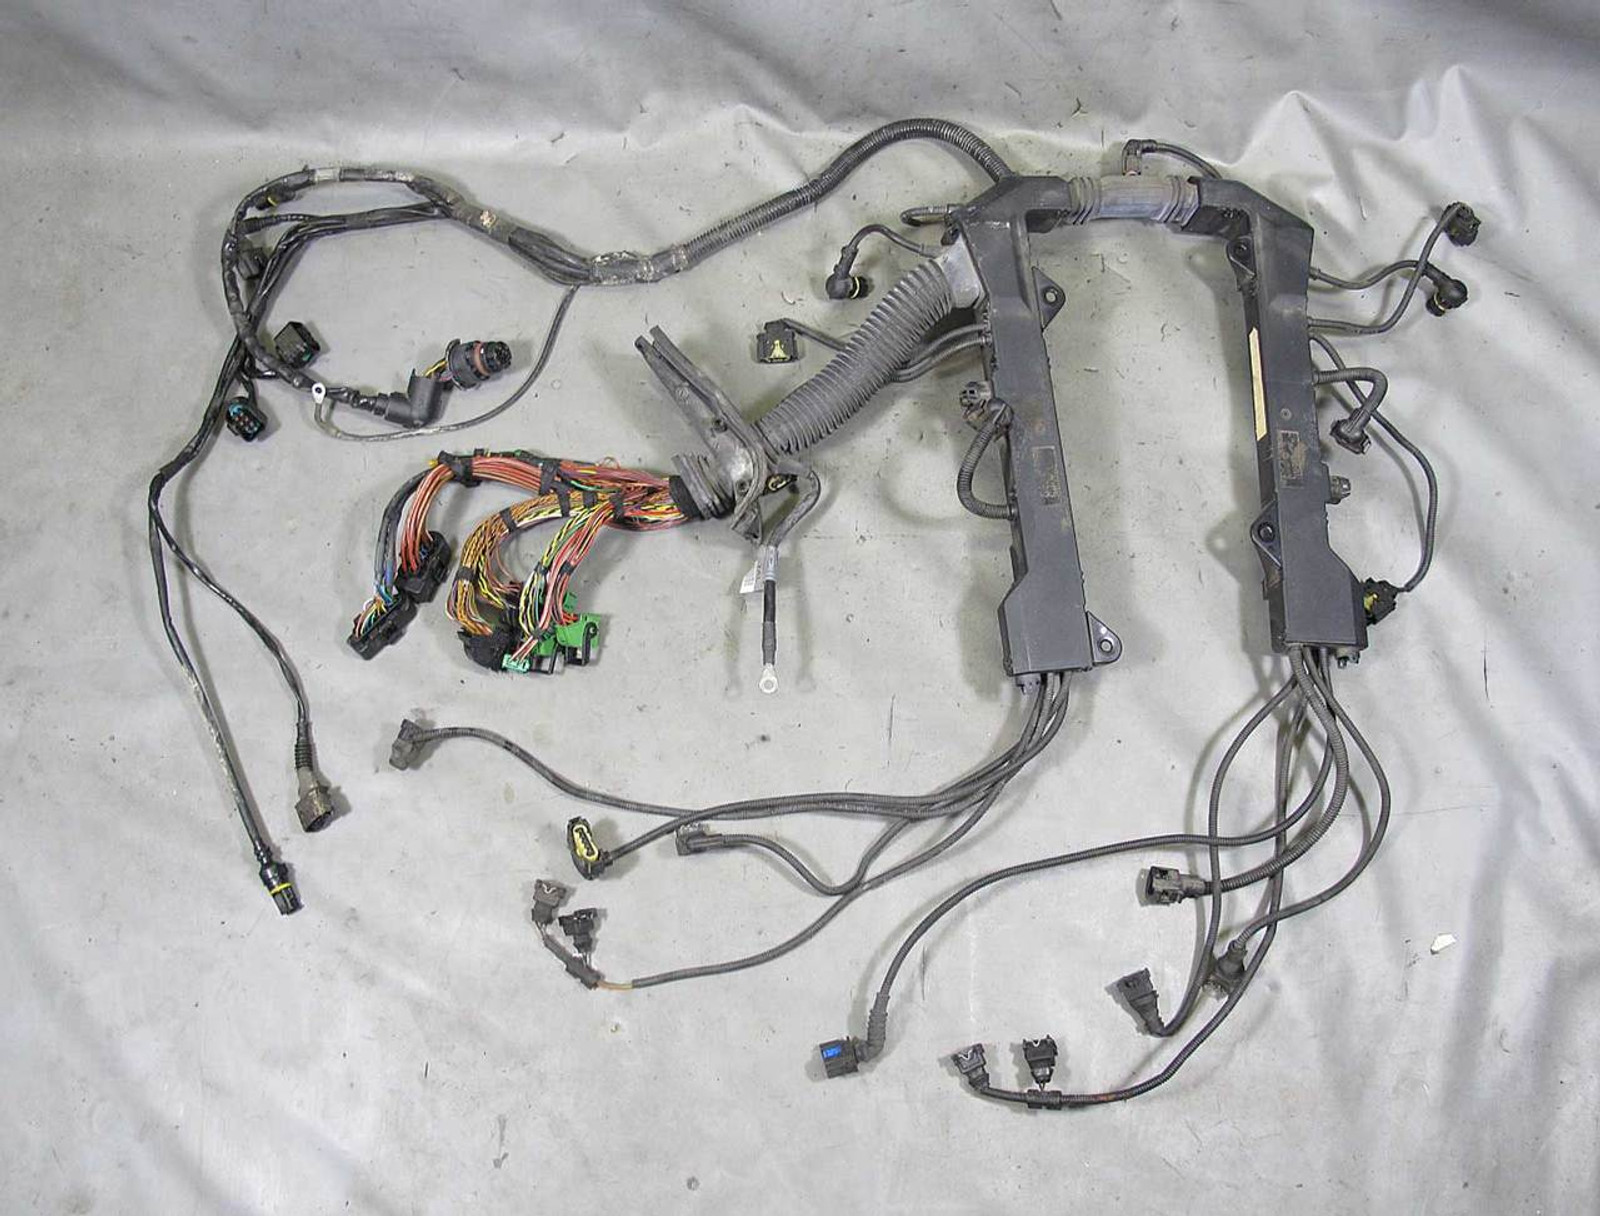 medium resolution of 1968 bmw 2002 wiring harness free vehicle wiring diagrams u2022 factory wire harness bmw wiring